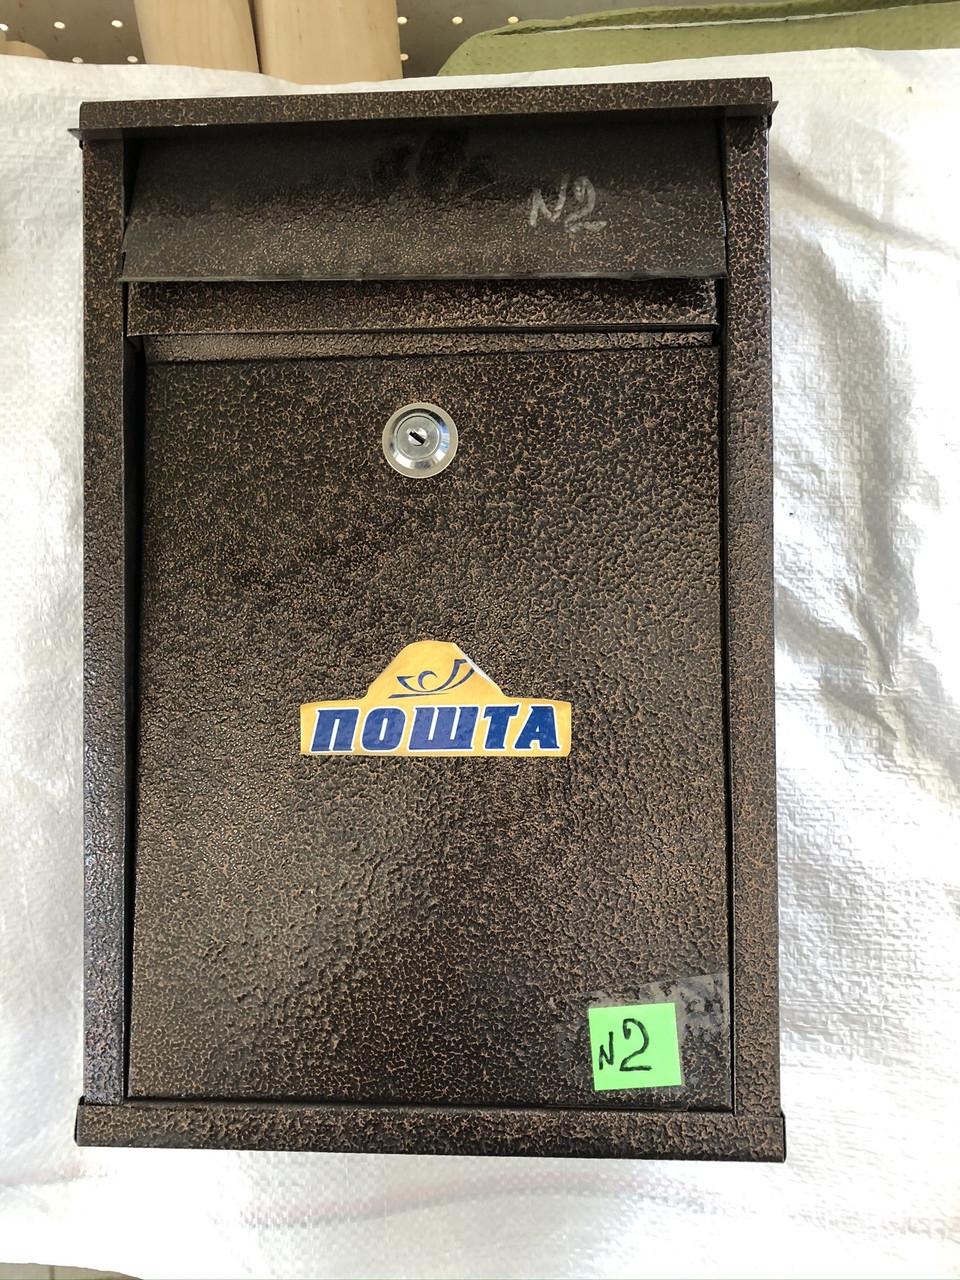 Ящик поштовий, модель 2